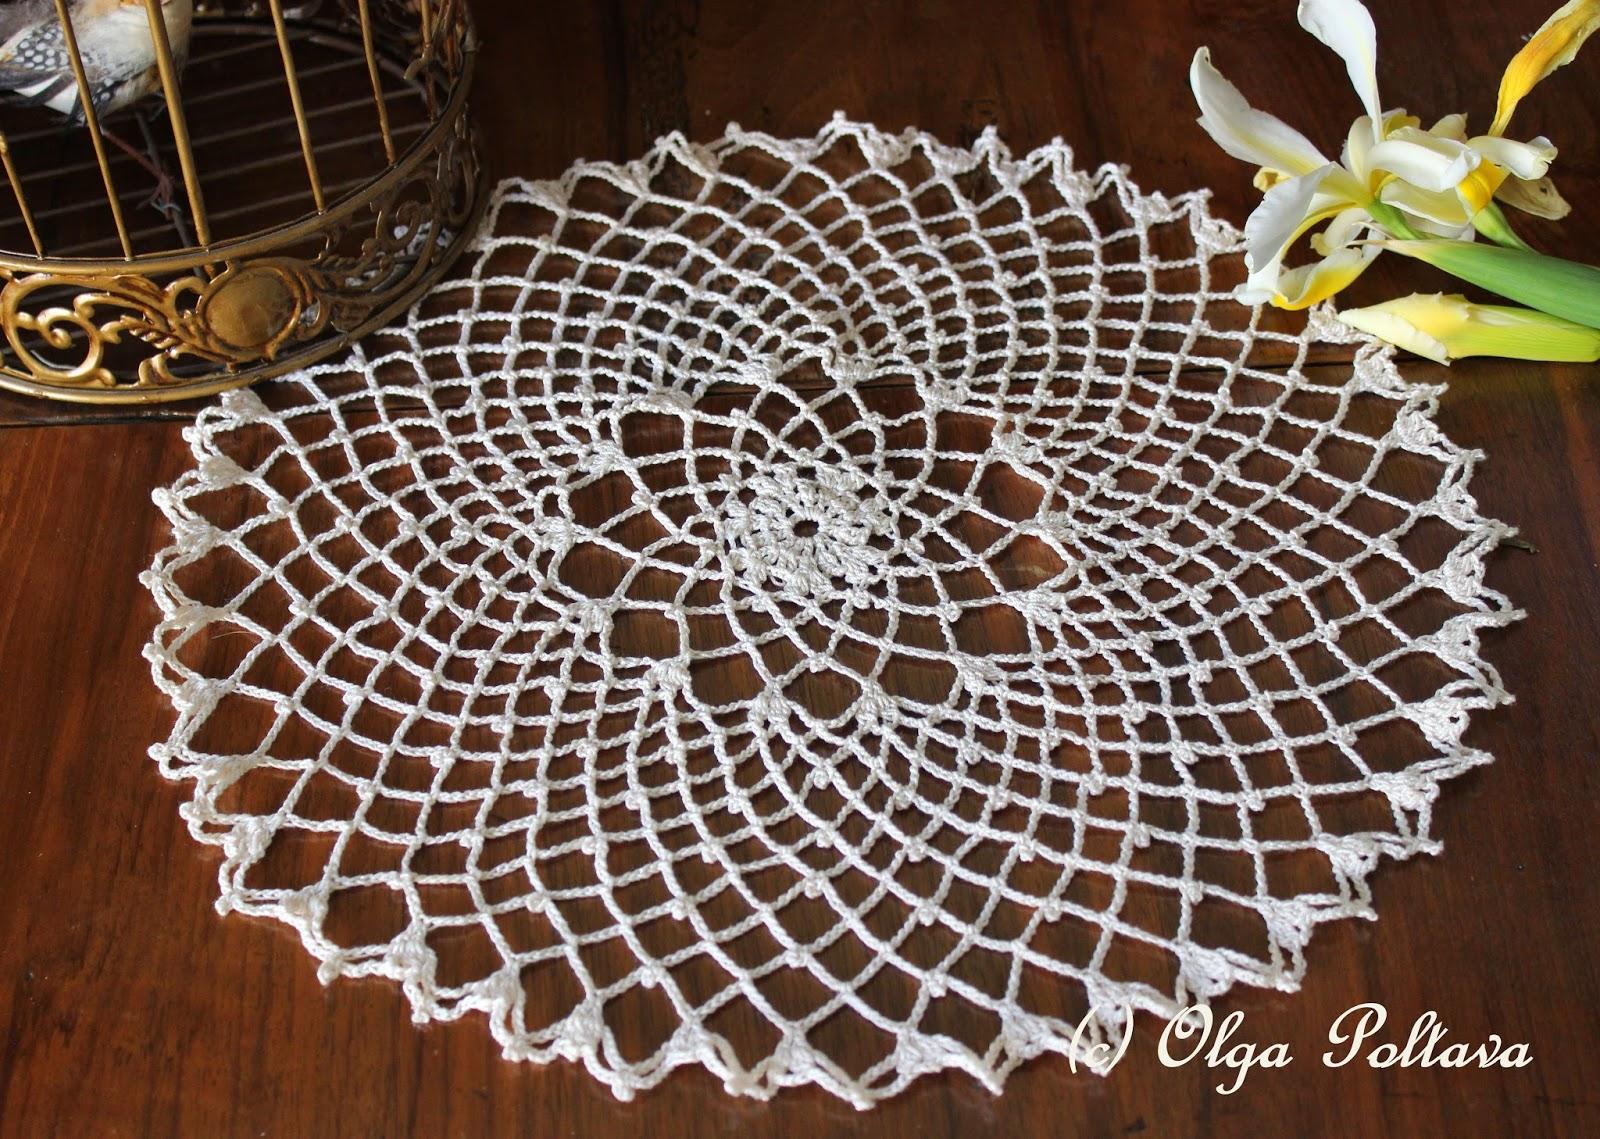 doily patterns small crochet doily klqnudc